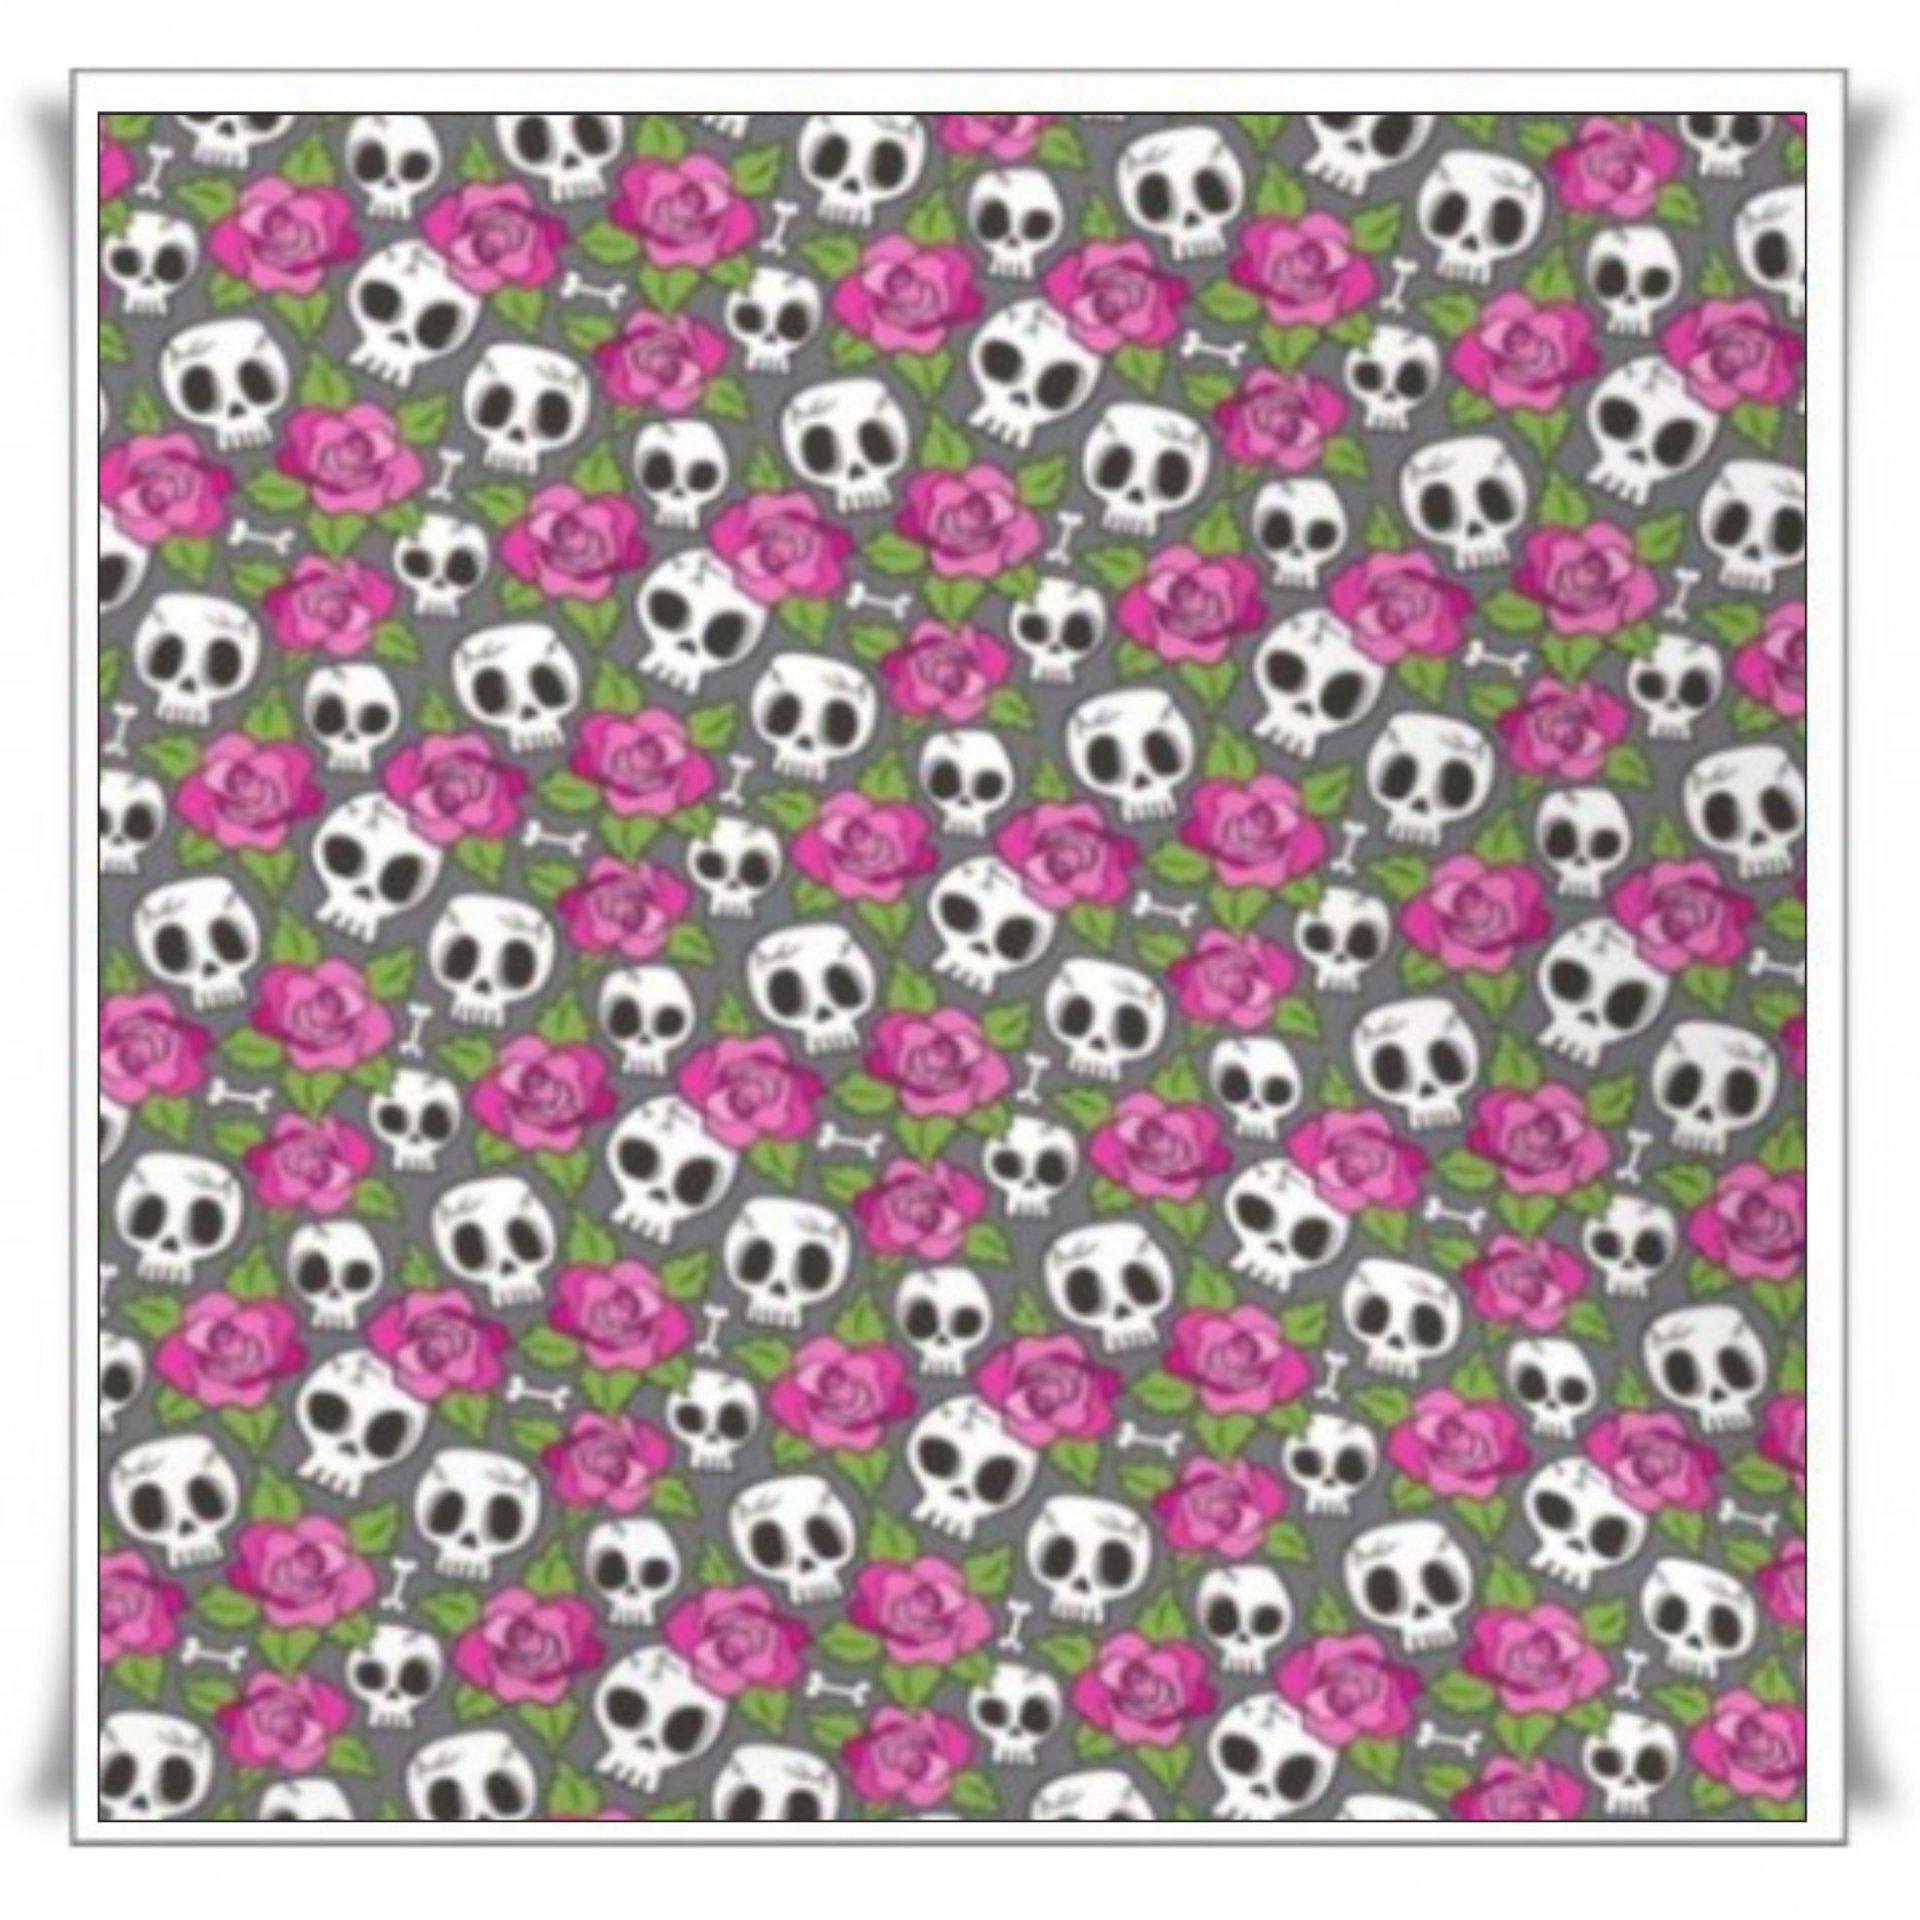 08 - SKULLS & ROSES (1).jpg